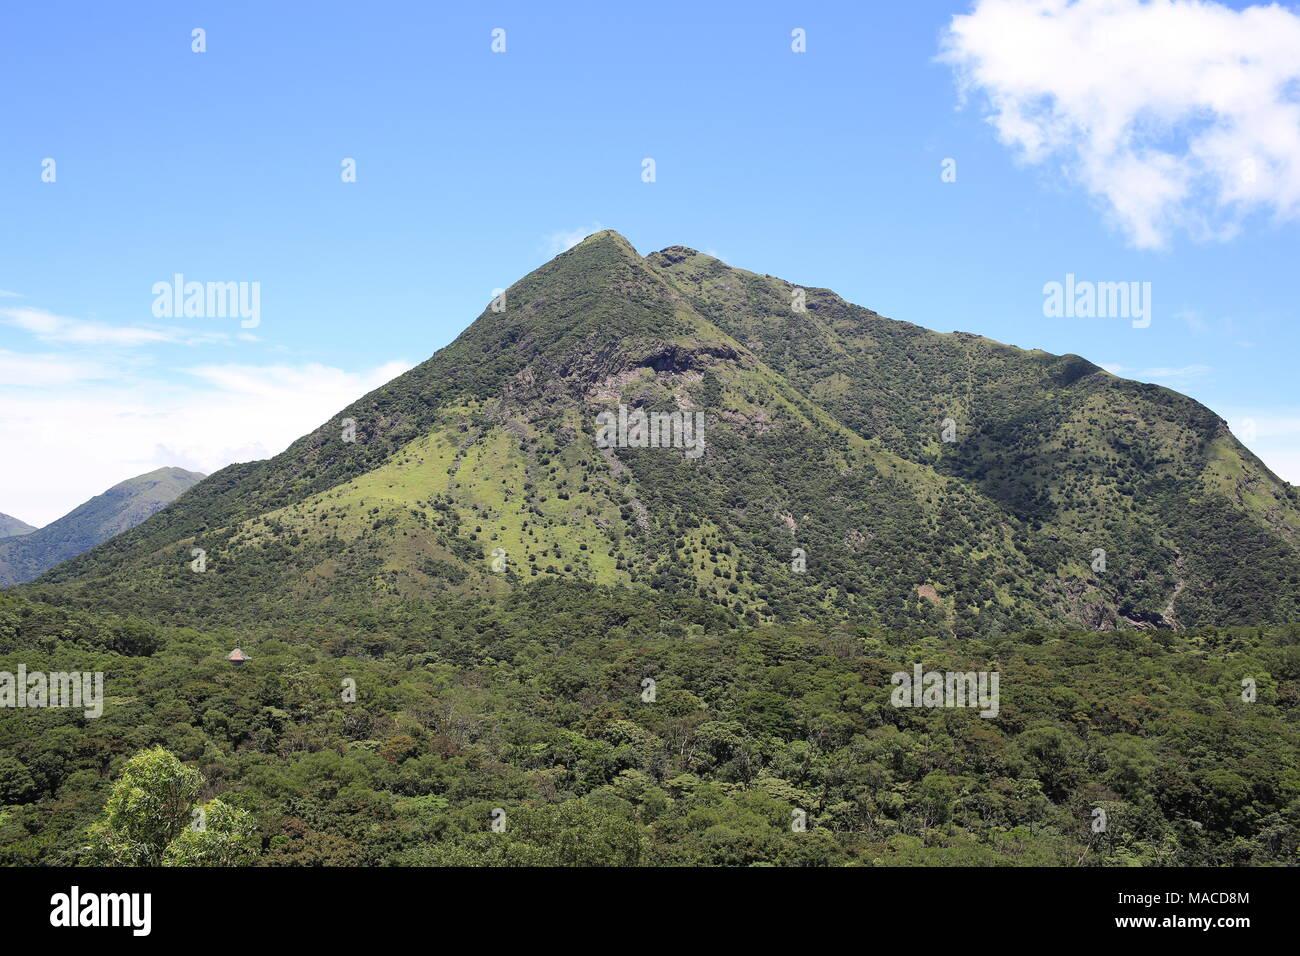 the peak of  Lantau Island in beautiful weather in summer - Stock Image